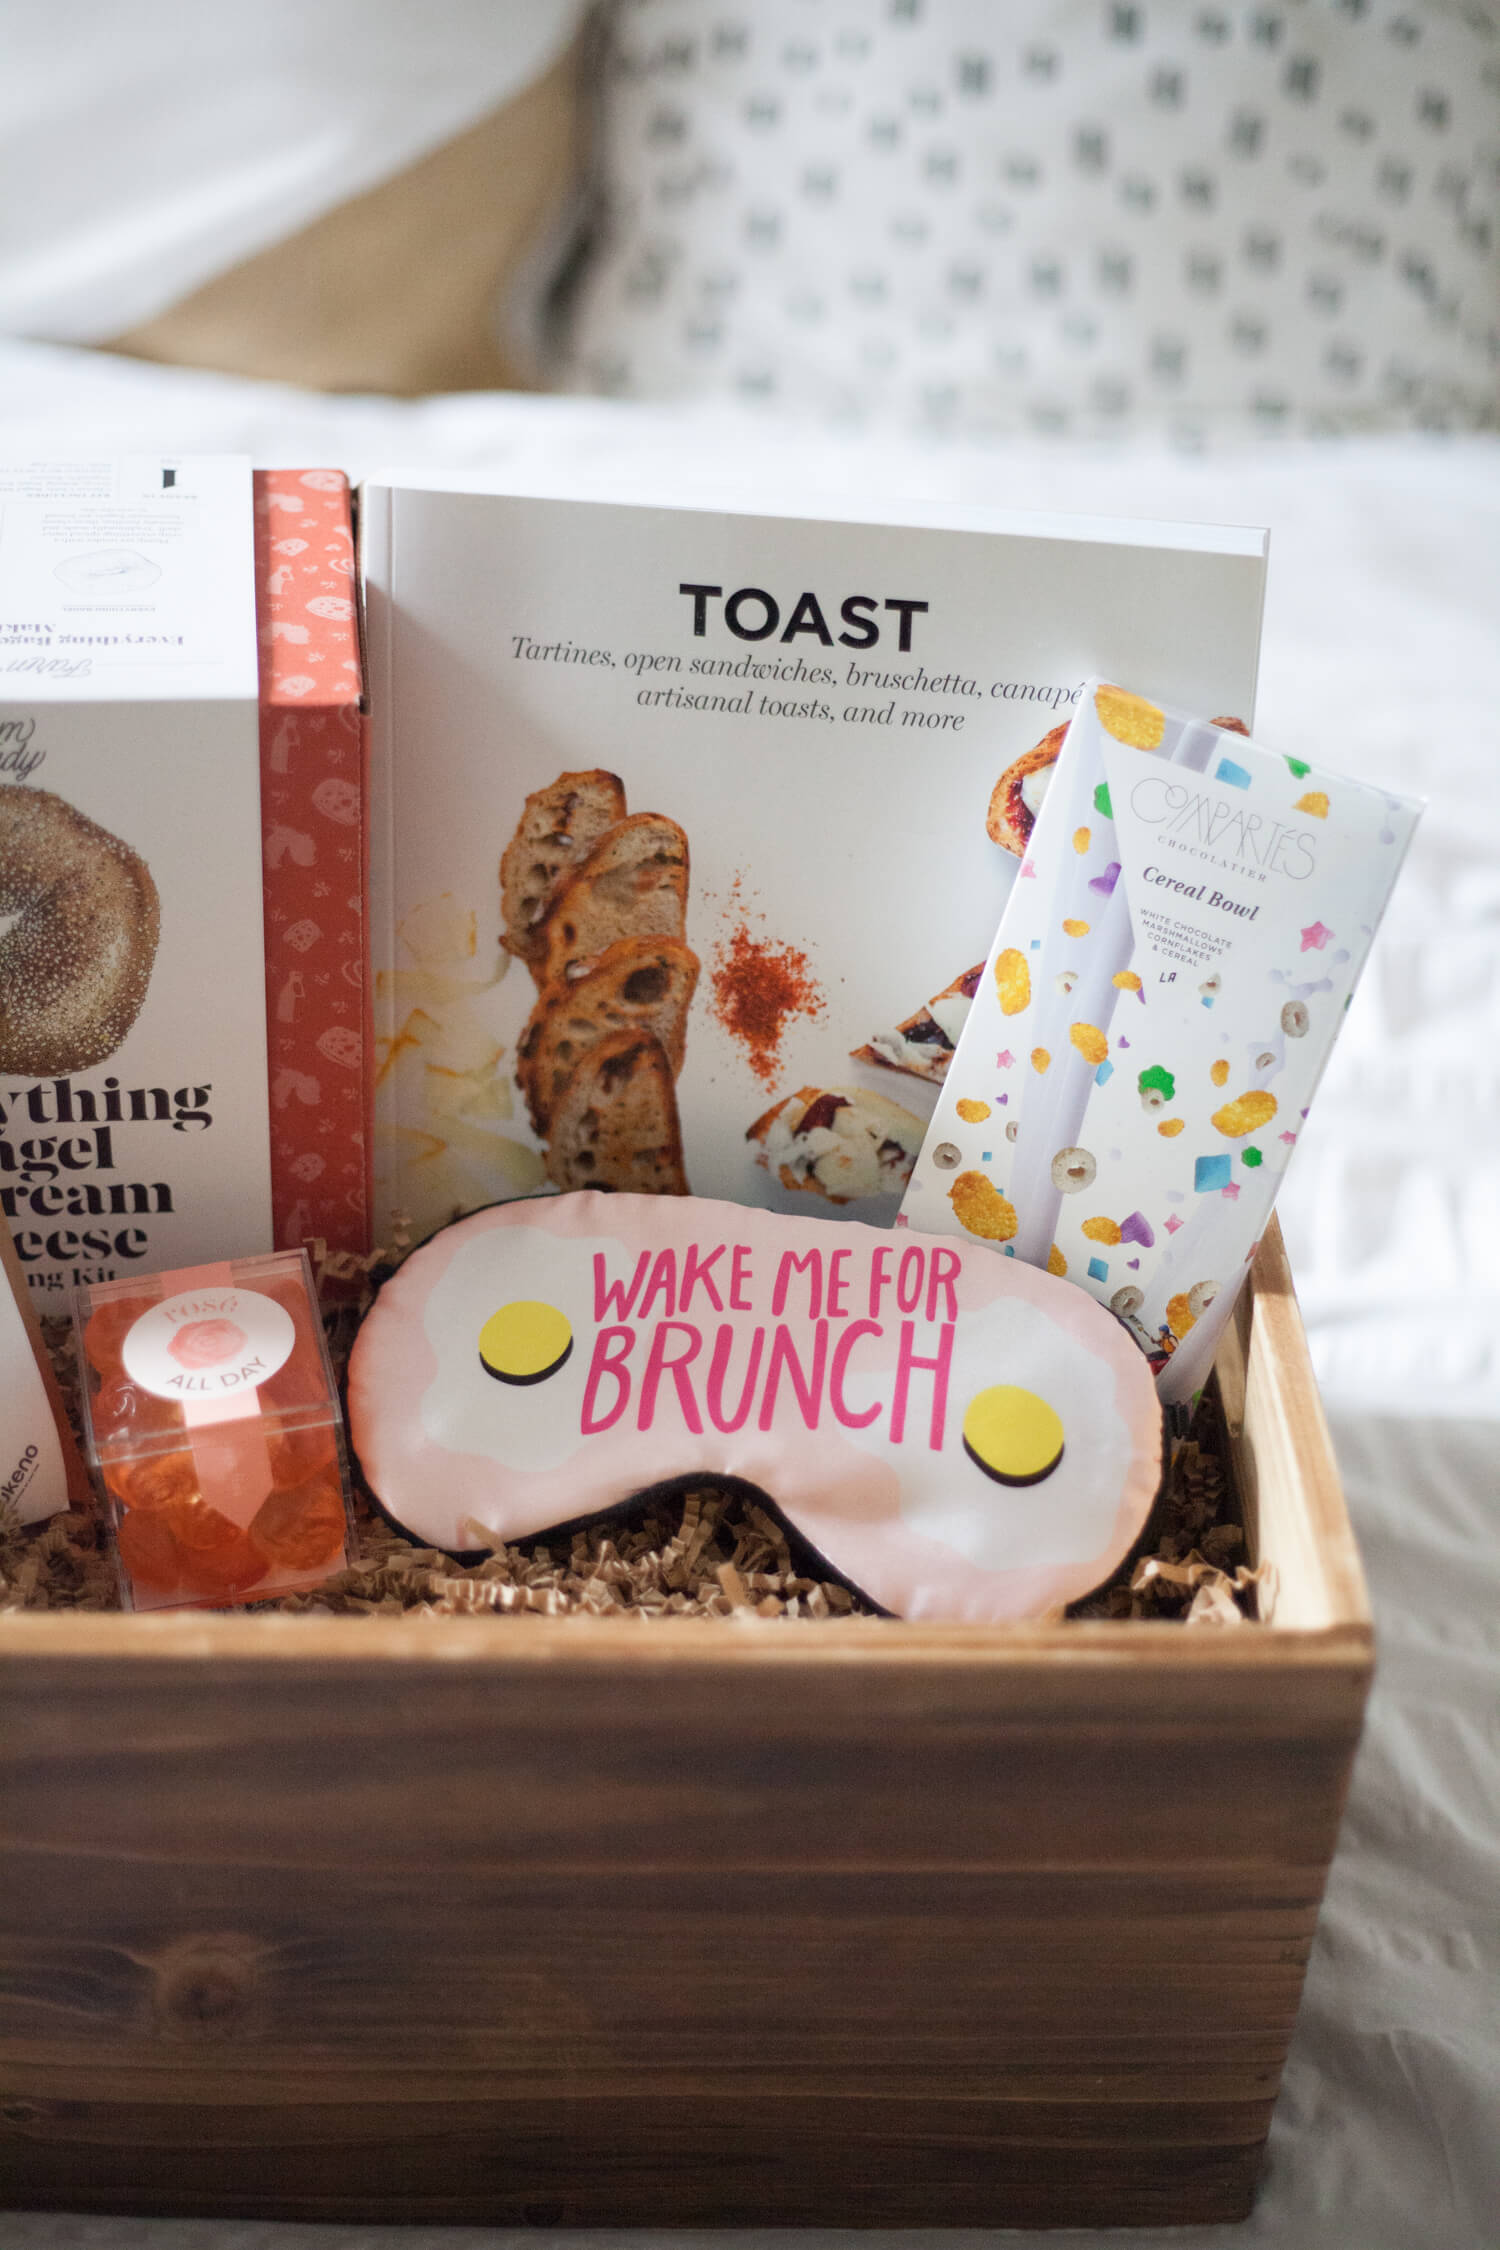 Brunch-themed adult gift basket ideas